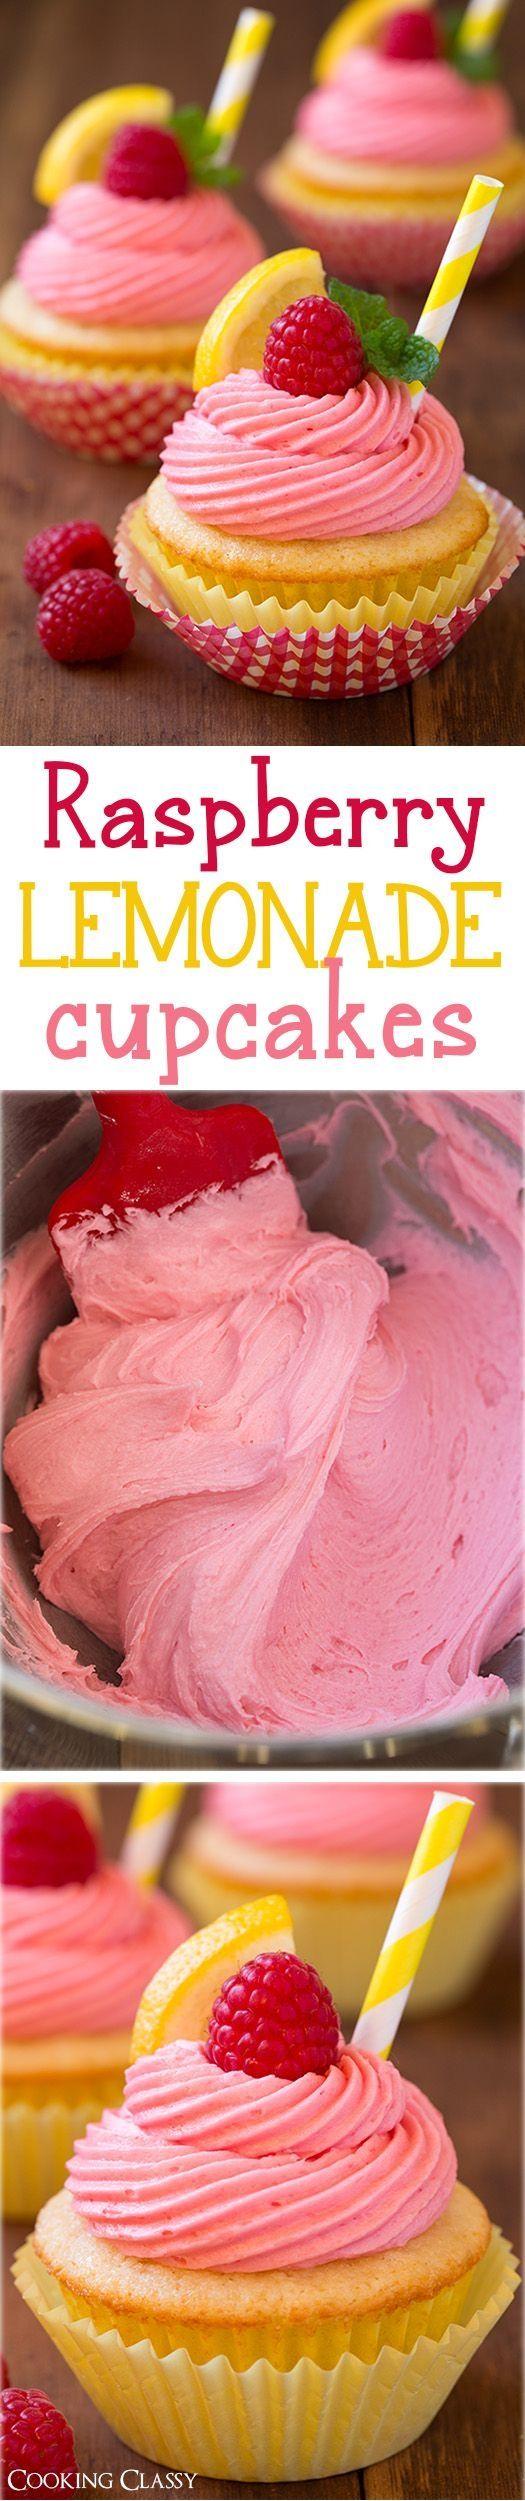 Raspberry Lemonade Cupcakes |  #cupcakes #lemonade #raspberry